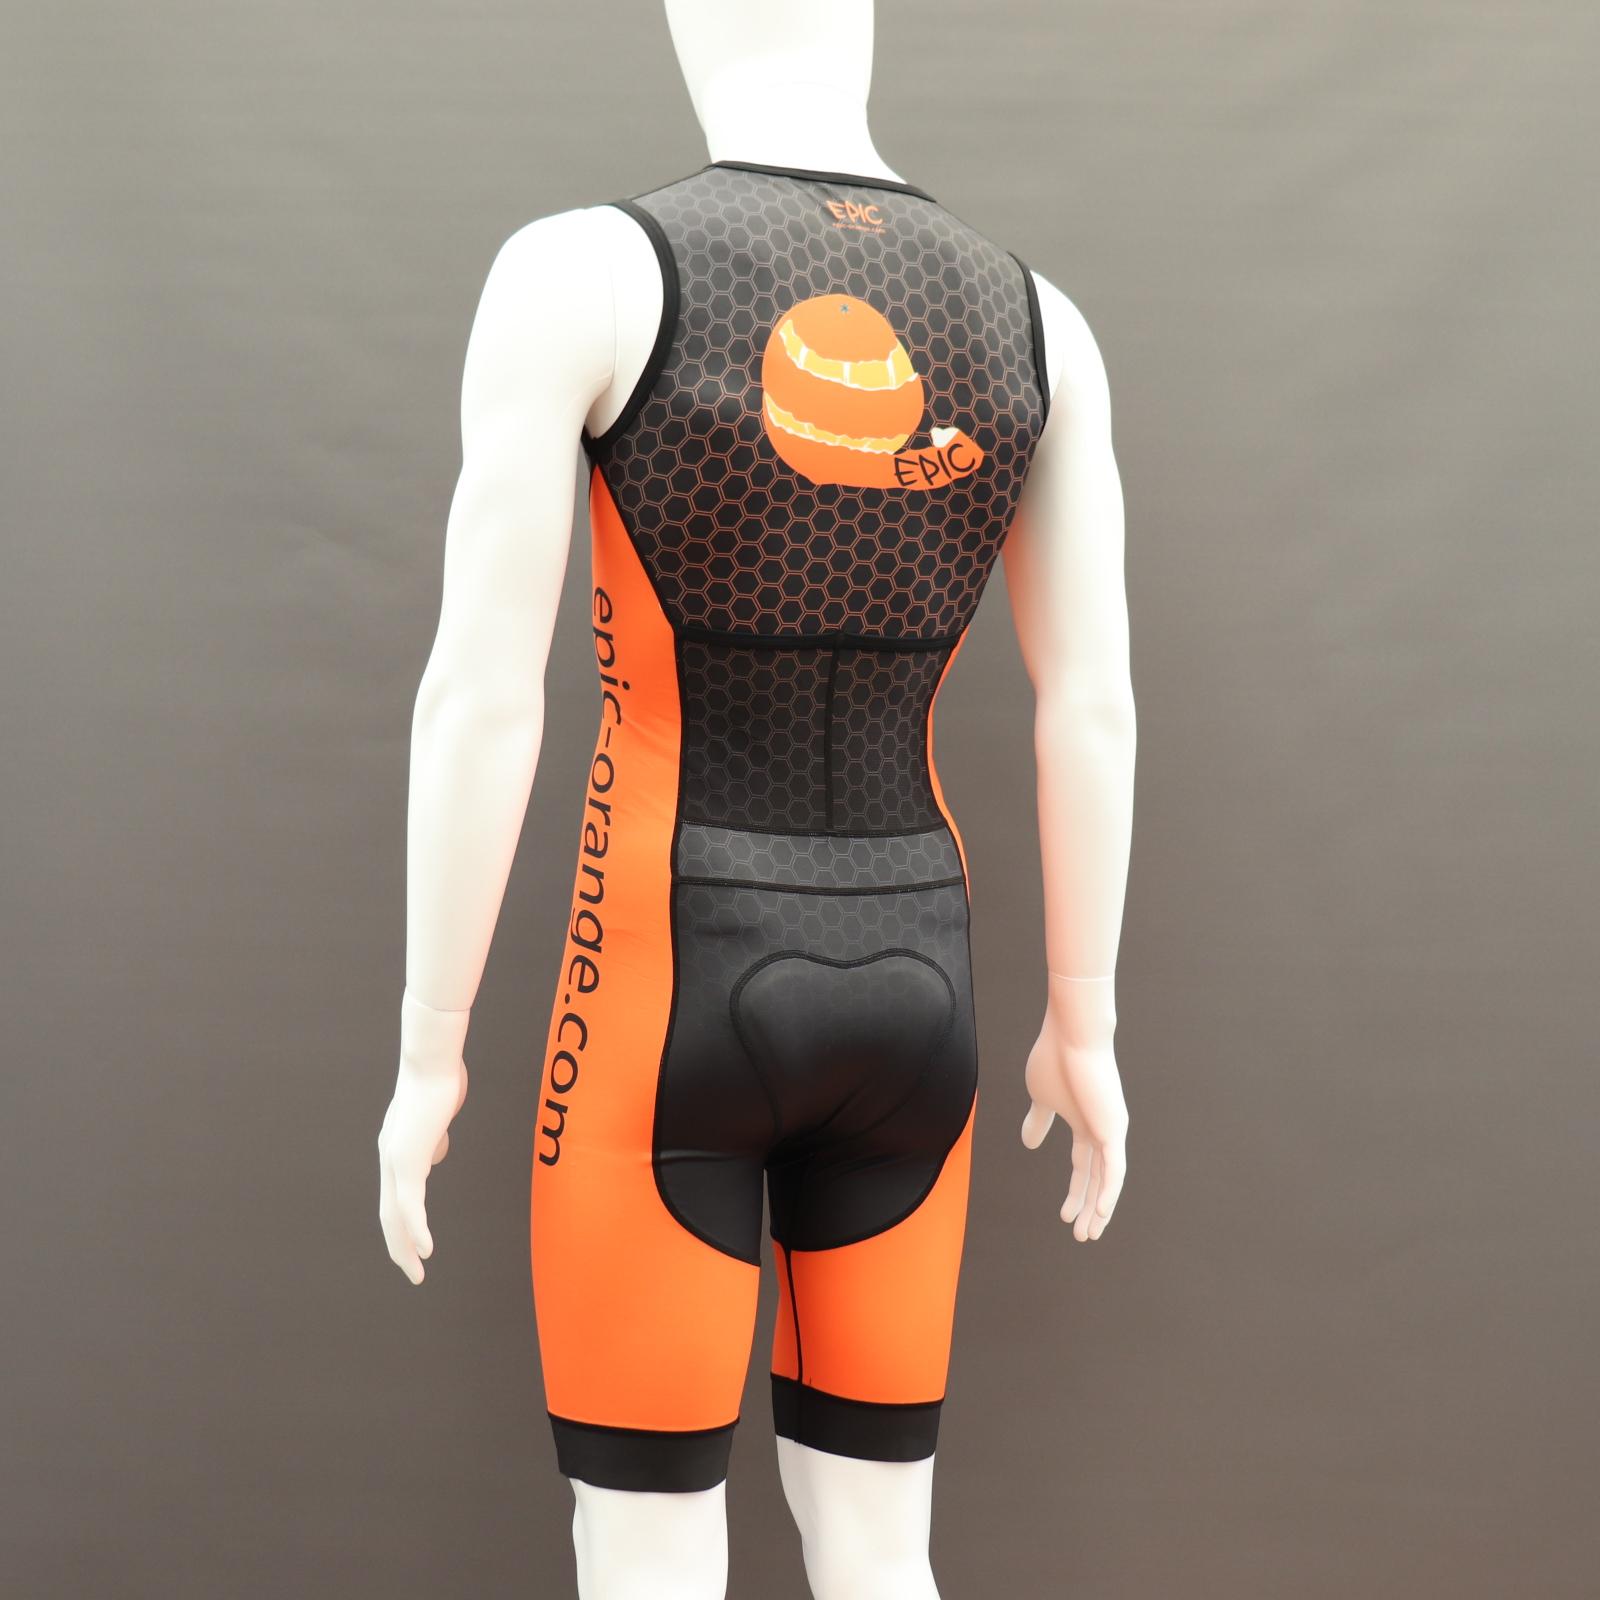 Custom Printed Endurance Triathlon Suits